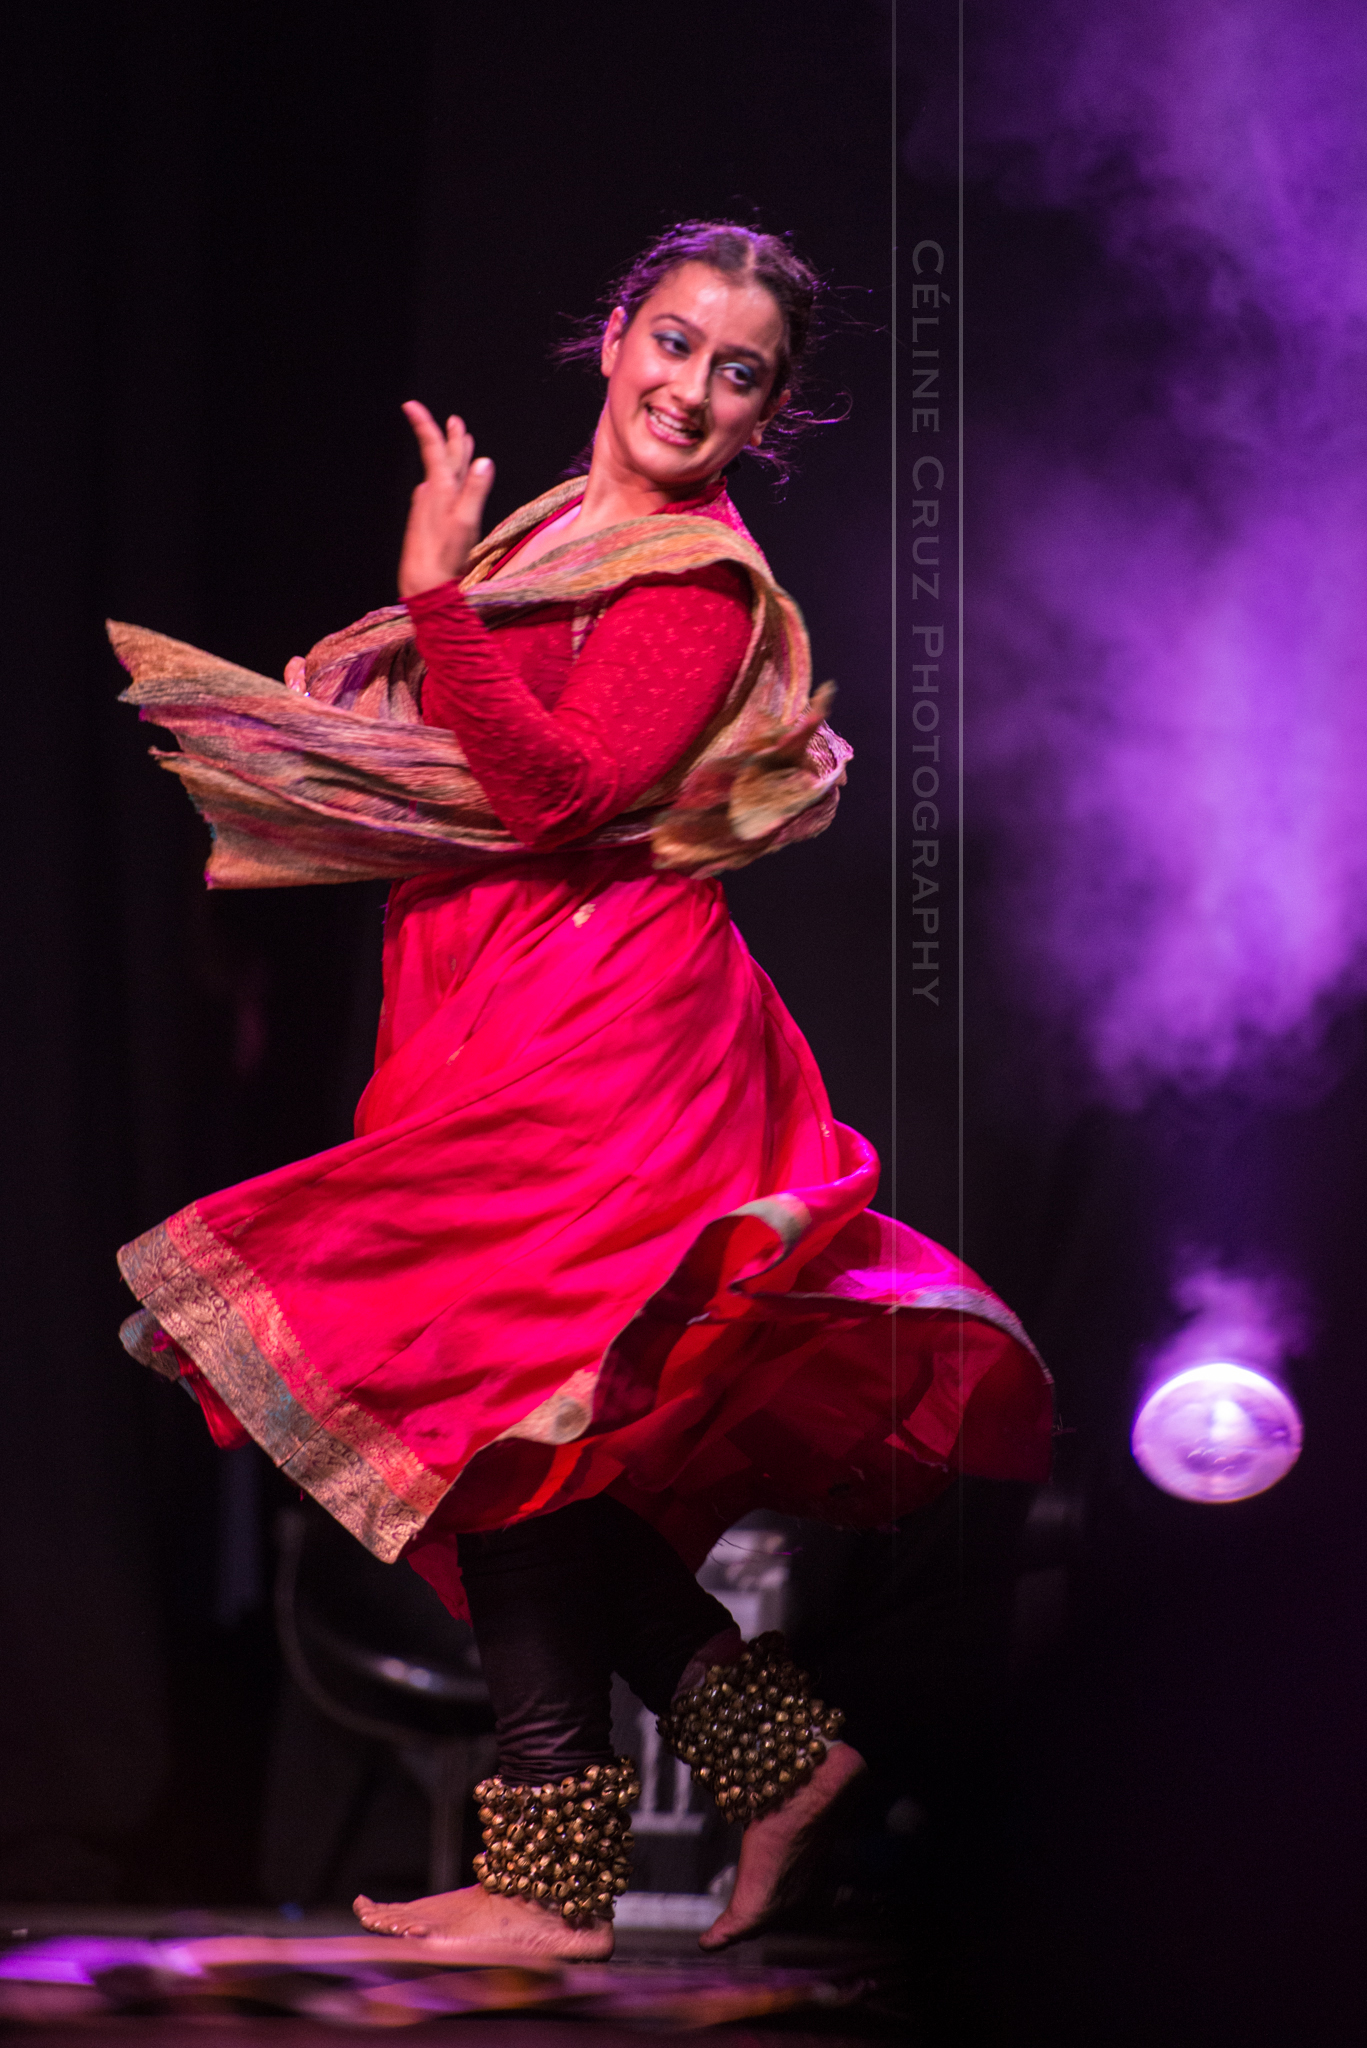 Sonia Sabri - Sonia Sabri Dance Company